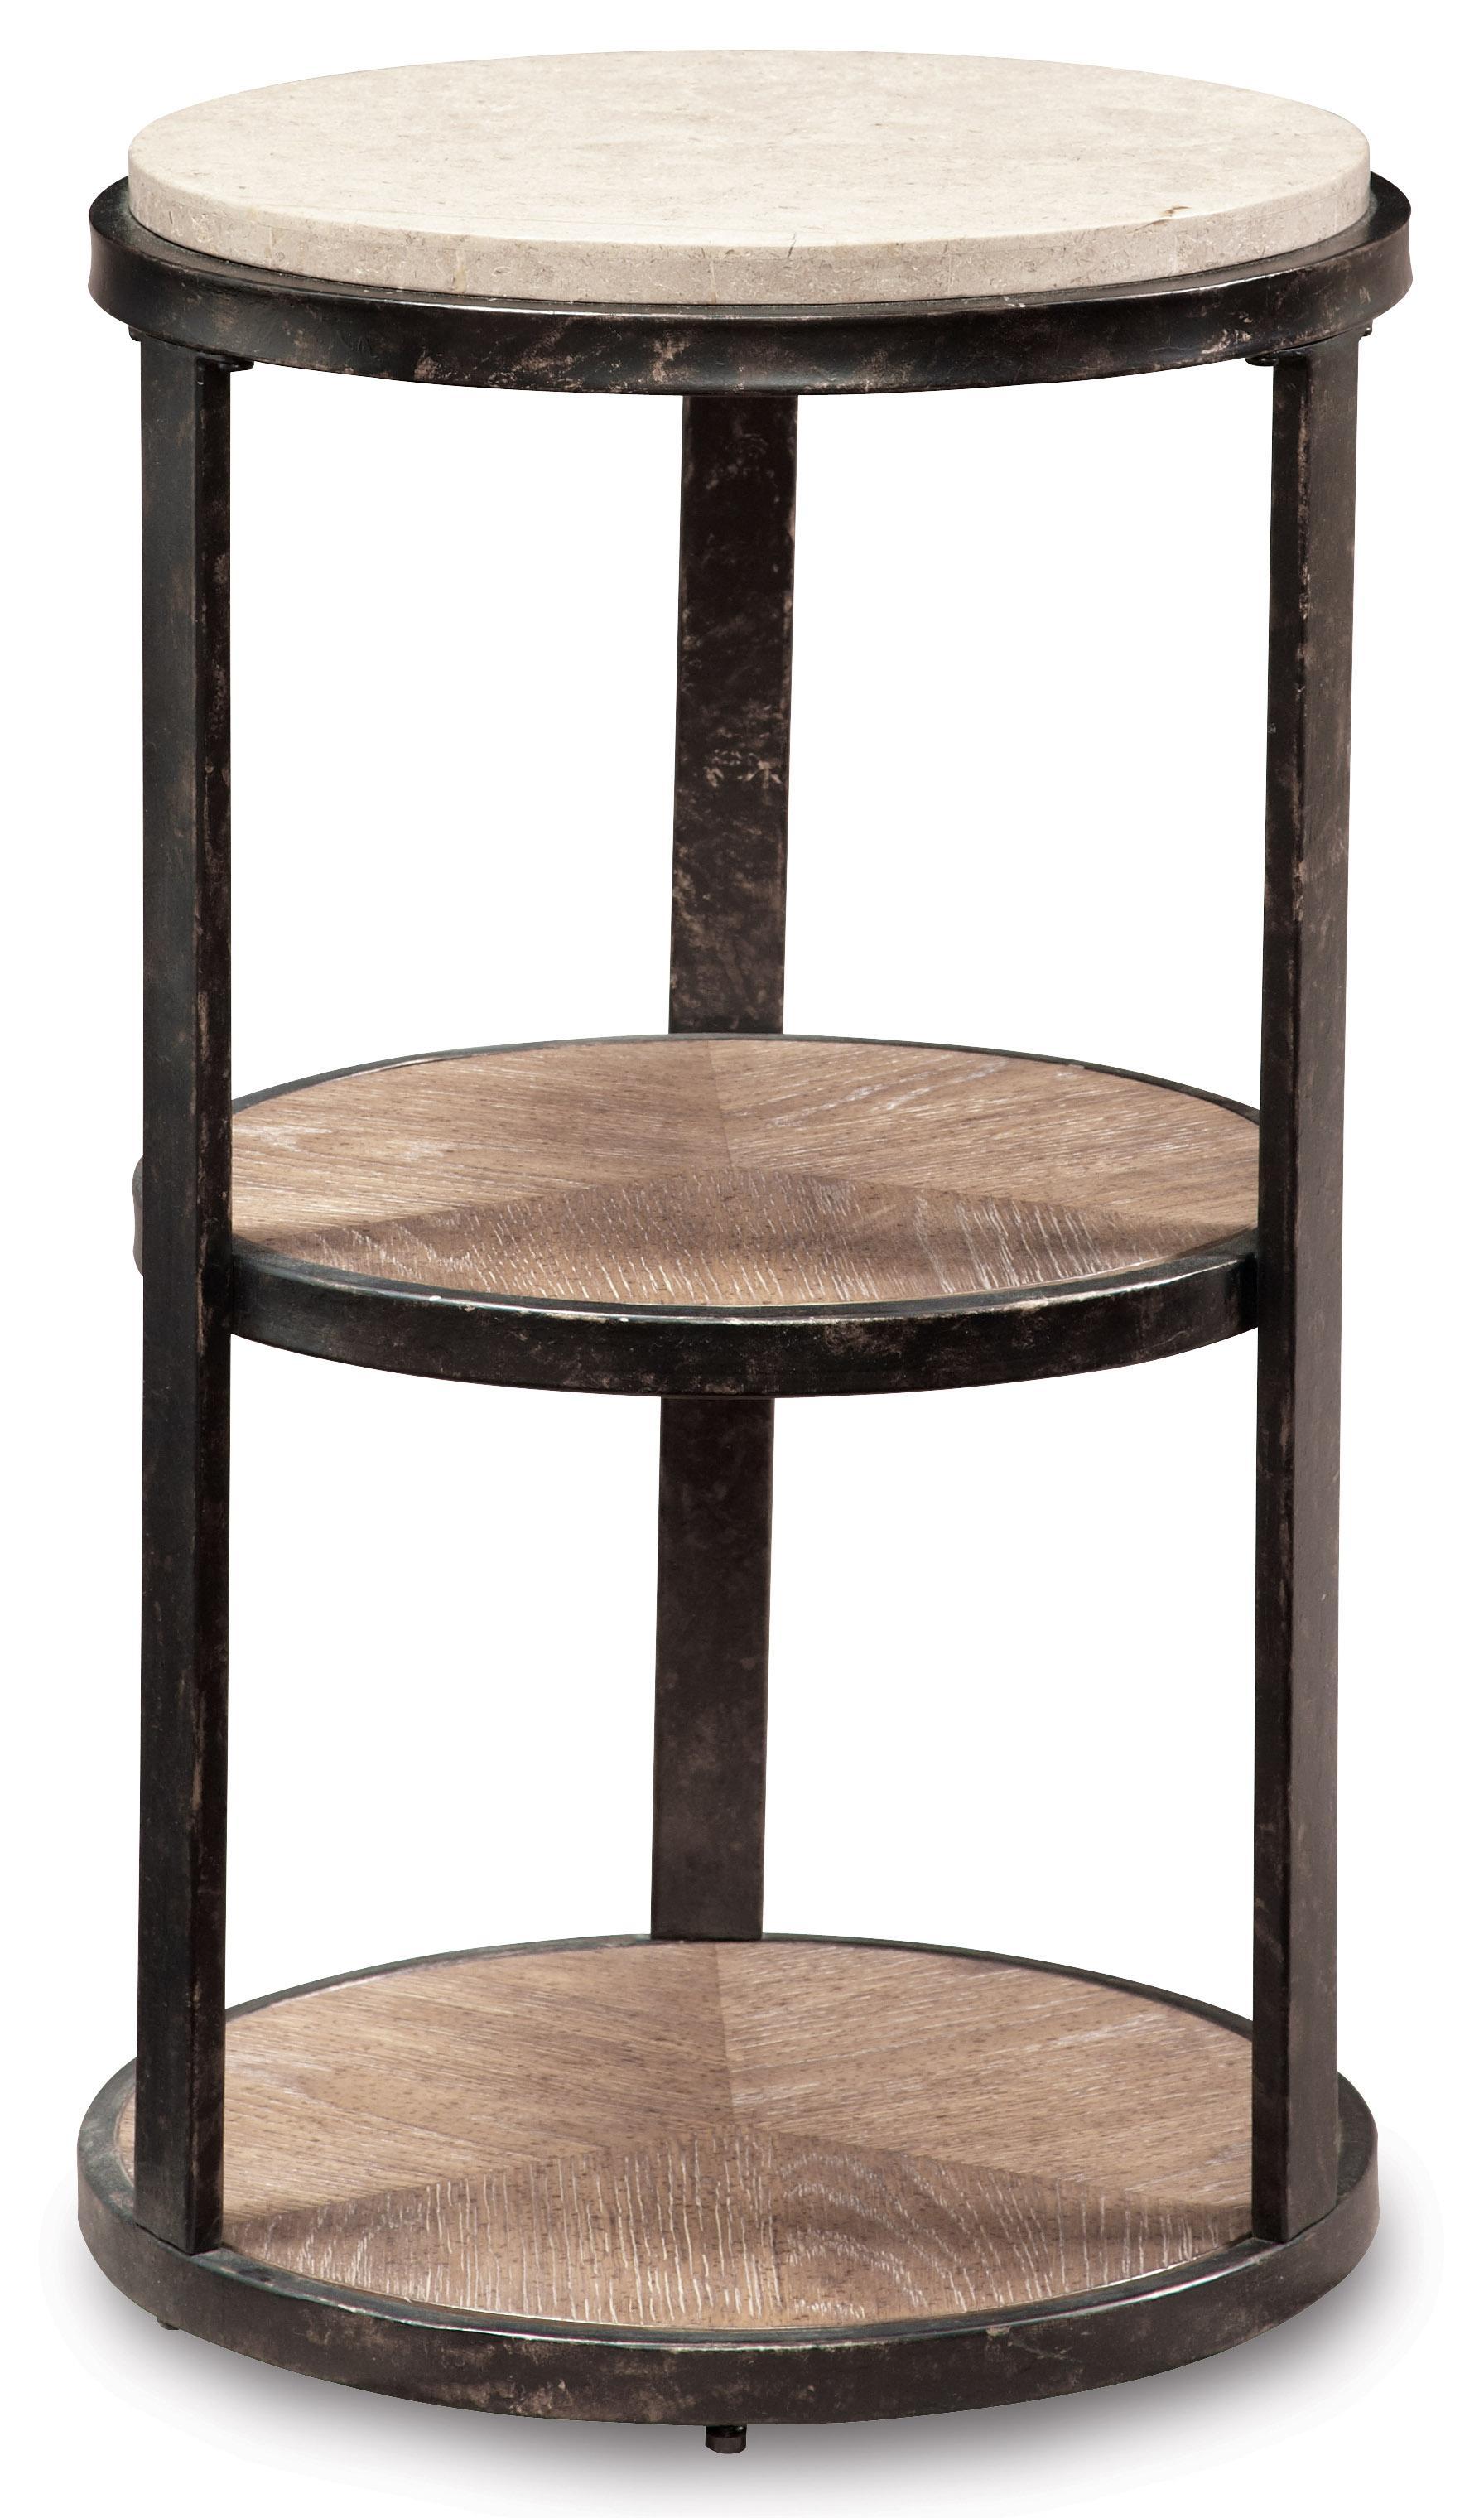 Belfort Signature Madera Pedestal Accent Table - Item Number: 192309-2303